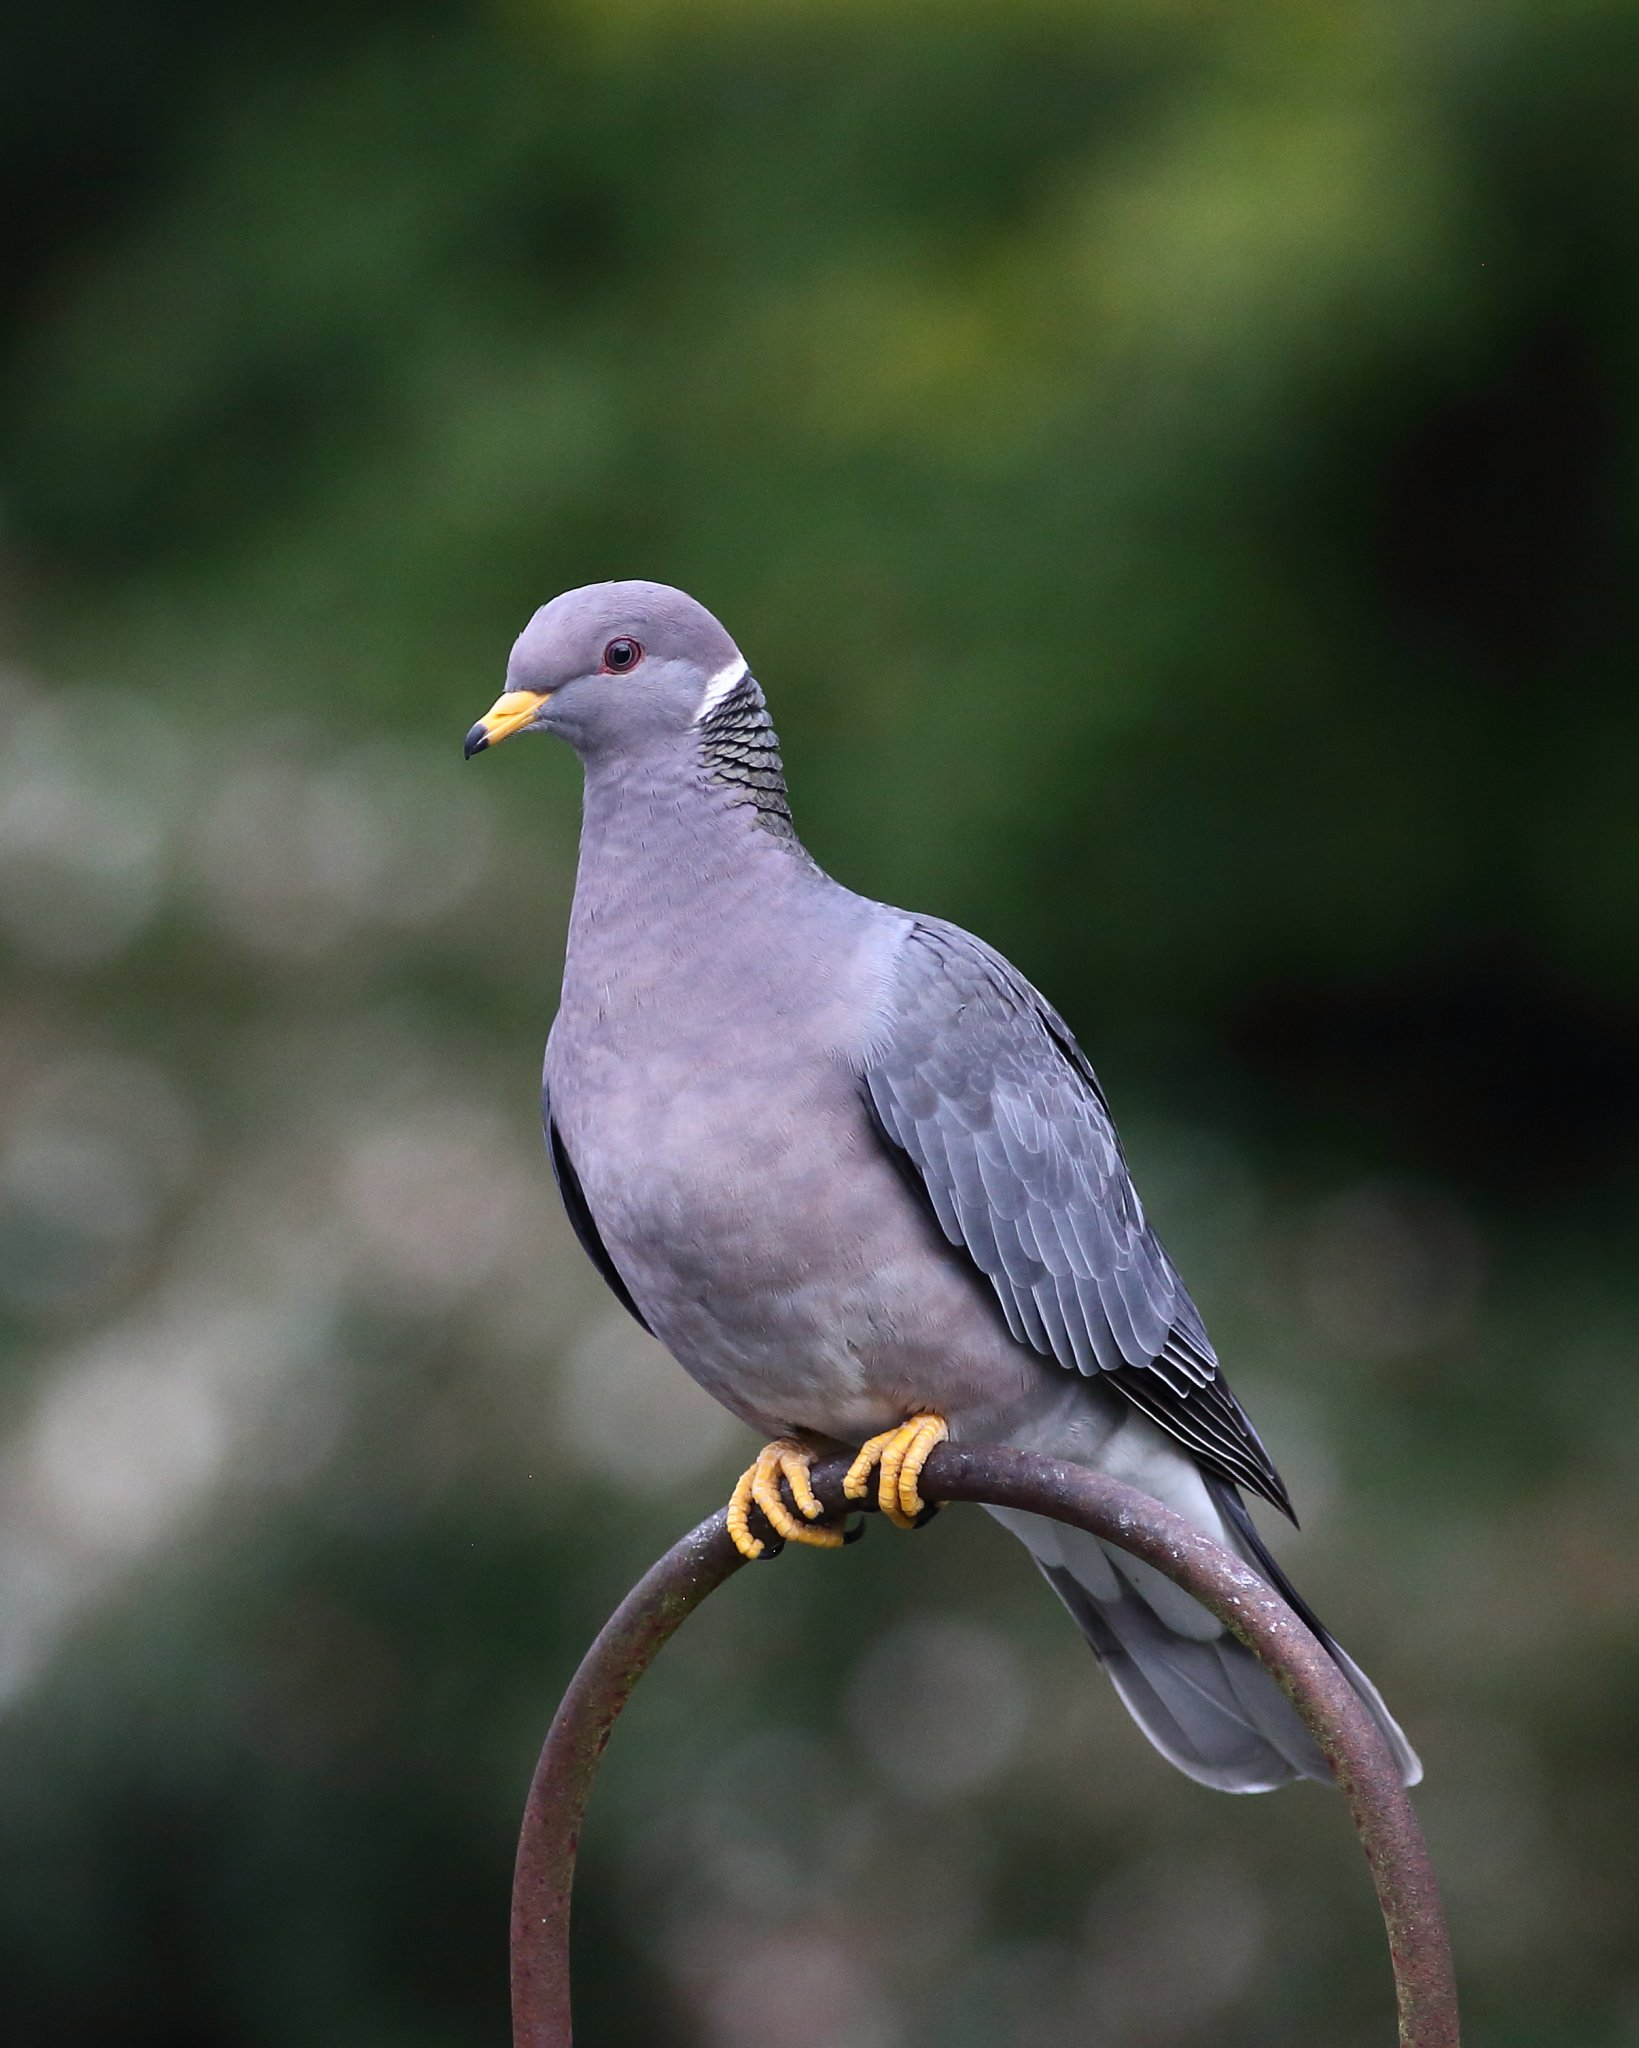 6-2-2020 Band-tailed Pigeon_0905.JPG